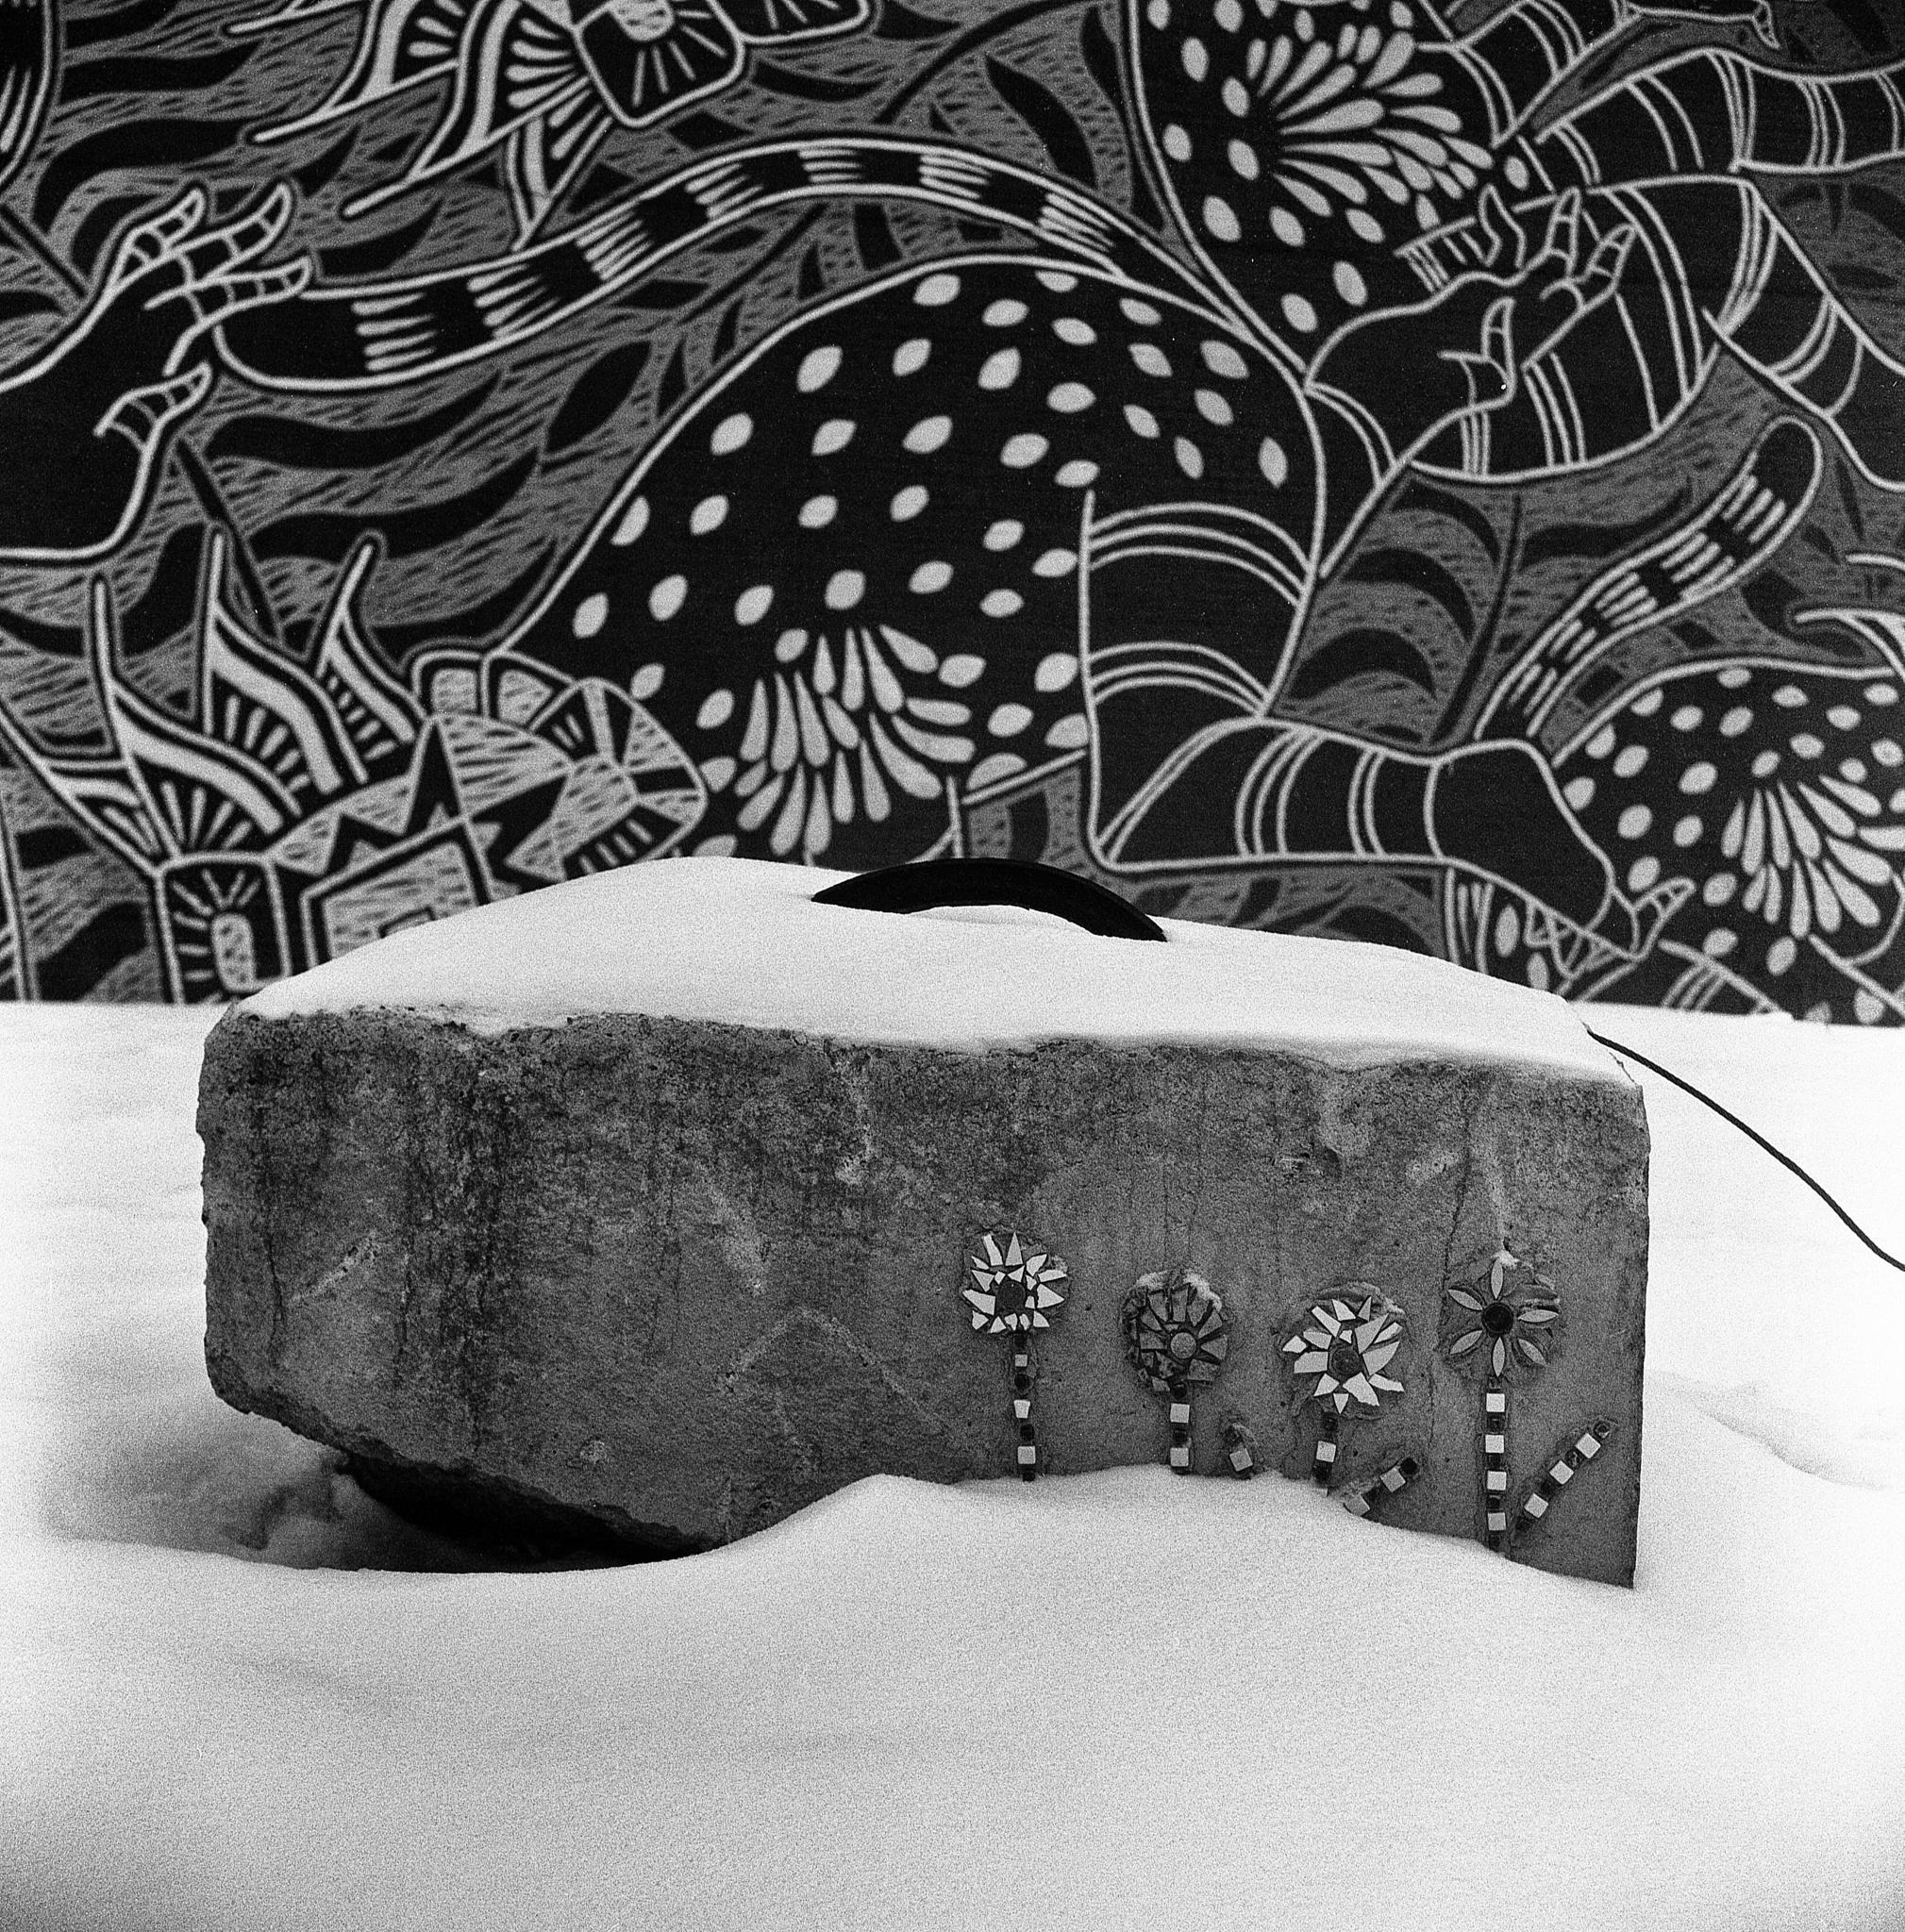 Deadpan No. 279. Stone Garden in Winter.  by dragos.stoic